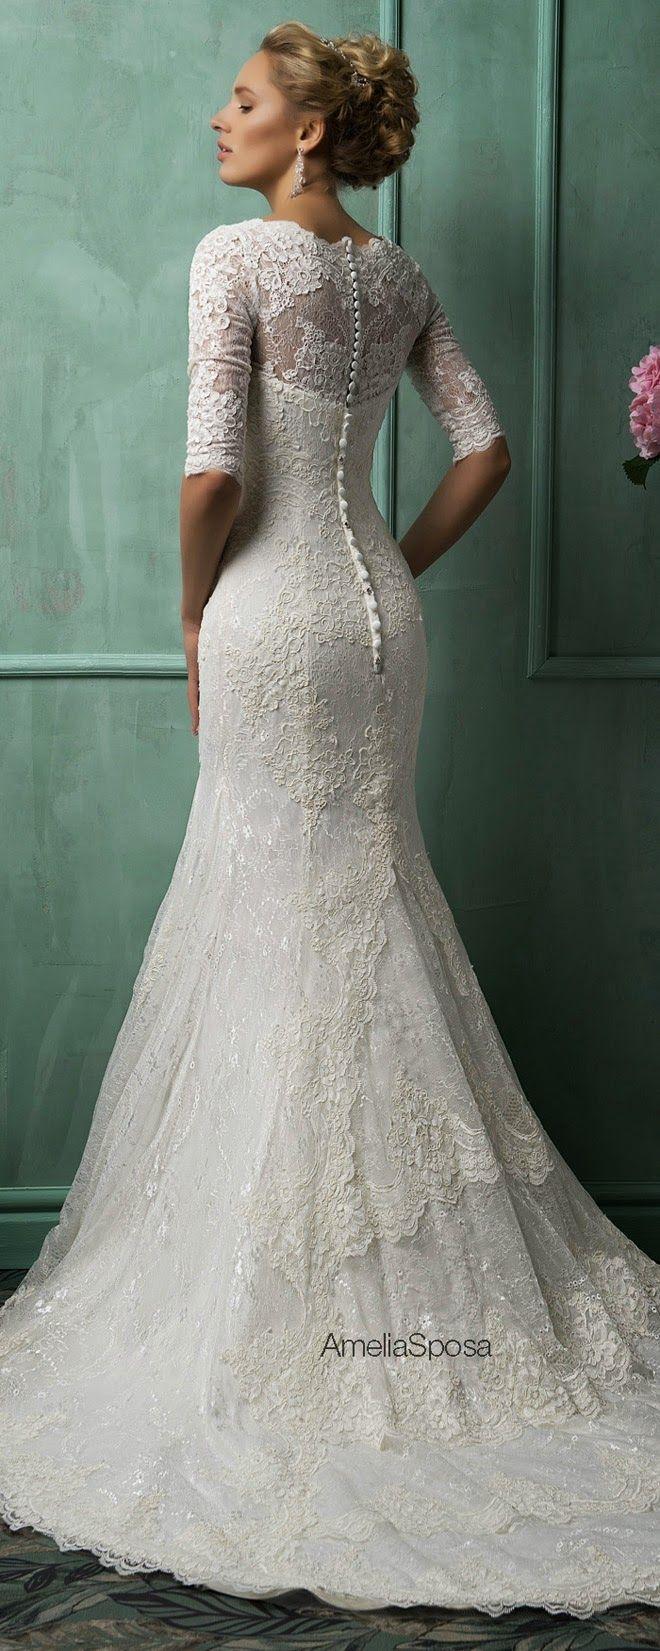 amelia-sposa-2014-wedding-dresses-1382330859_full - Belle The Magazine